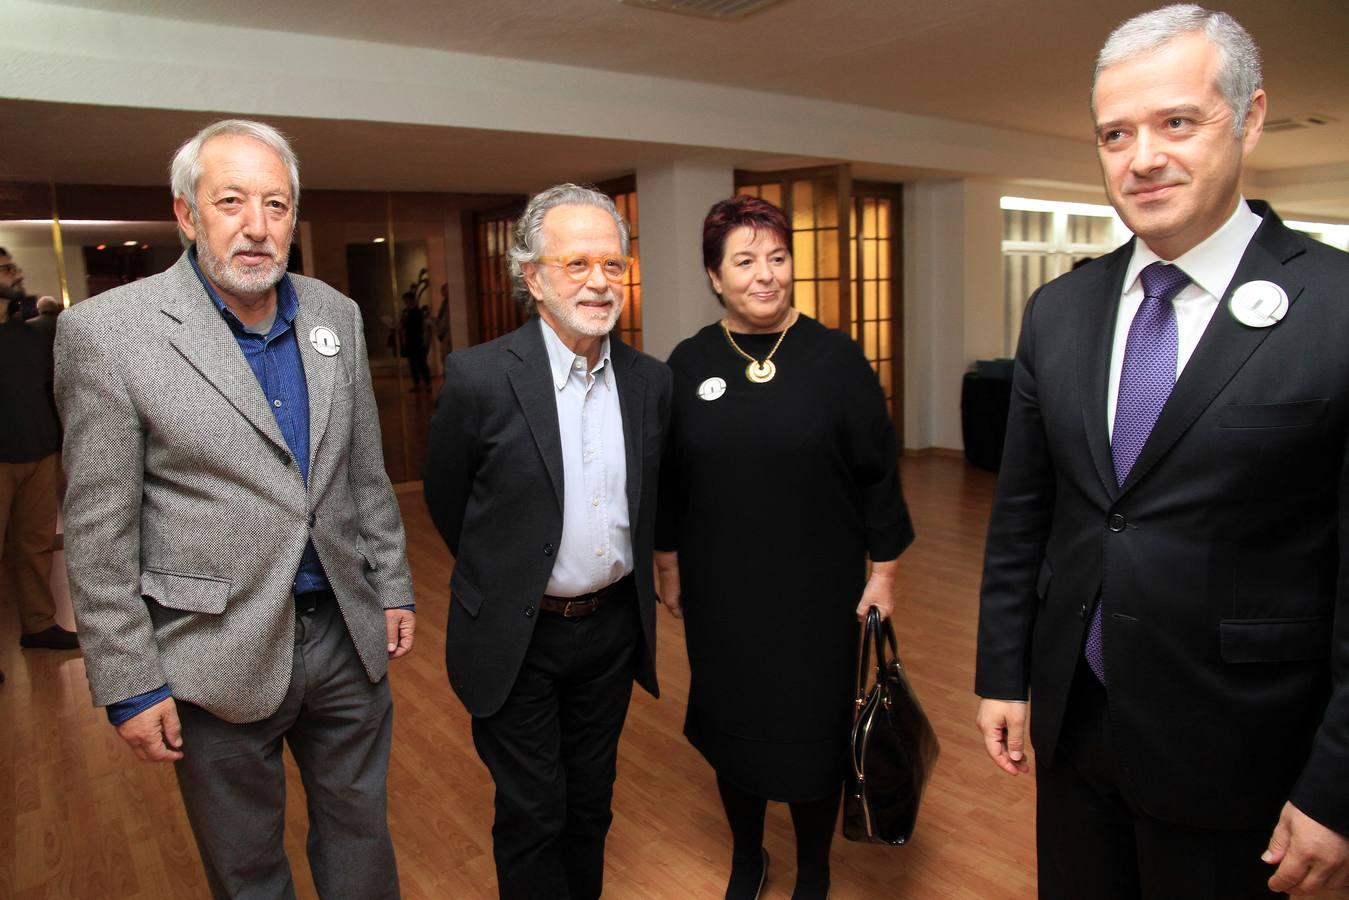 La Muestra de Cine de Segovia se presenta en Madrid